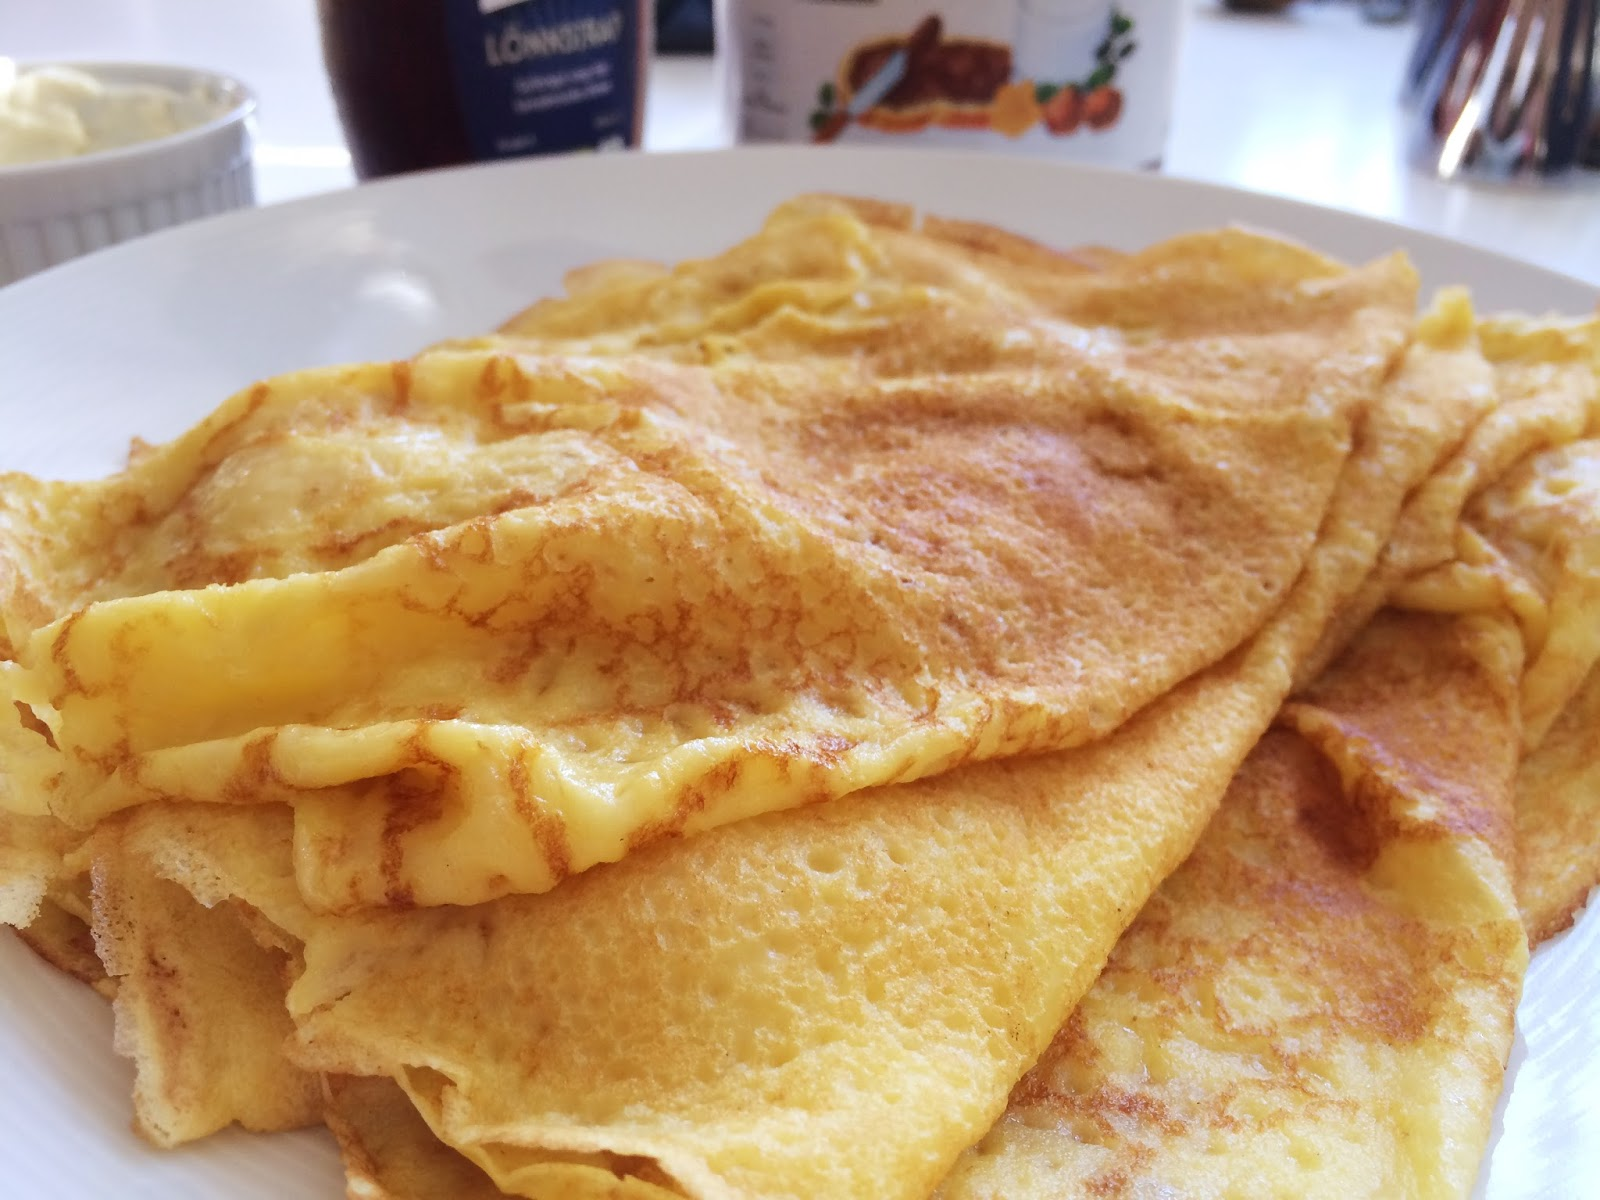 pannkakor majsmjöl ägg